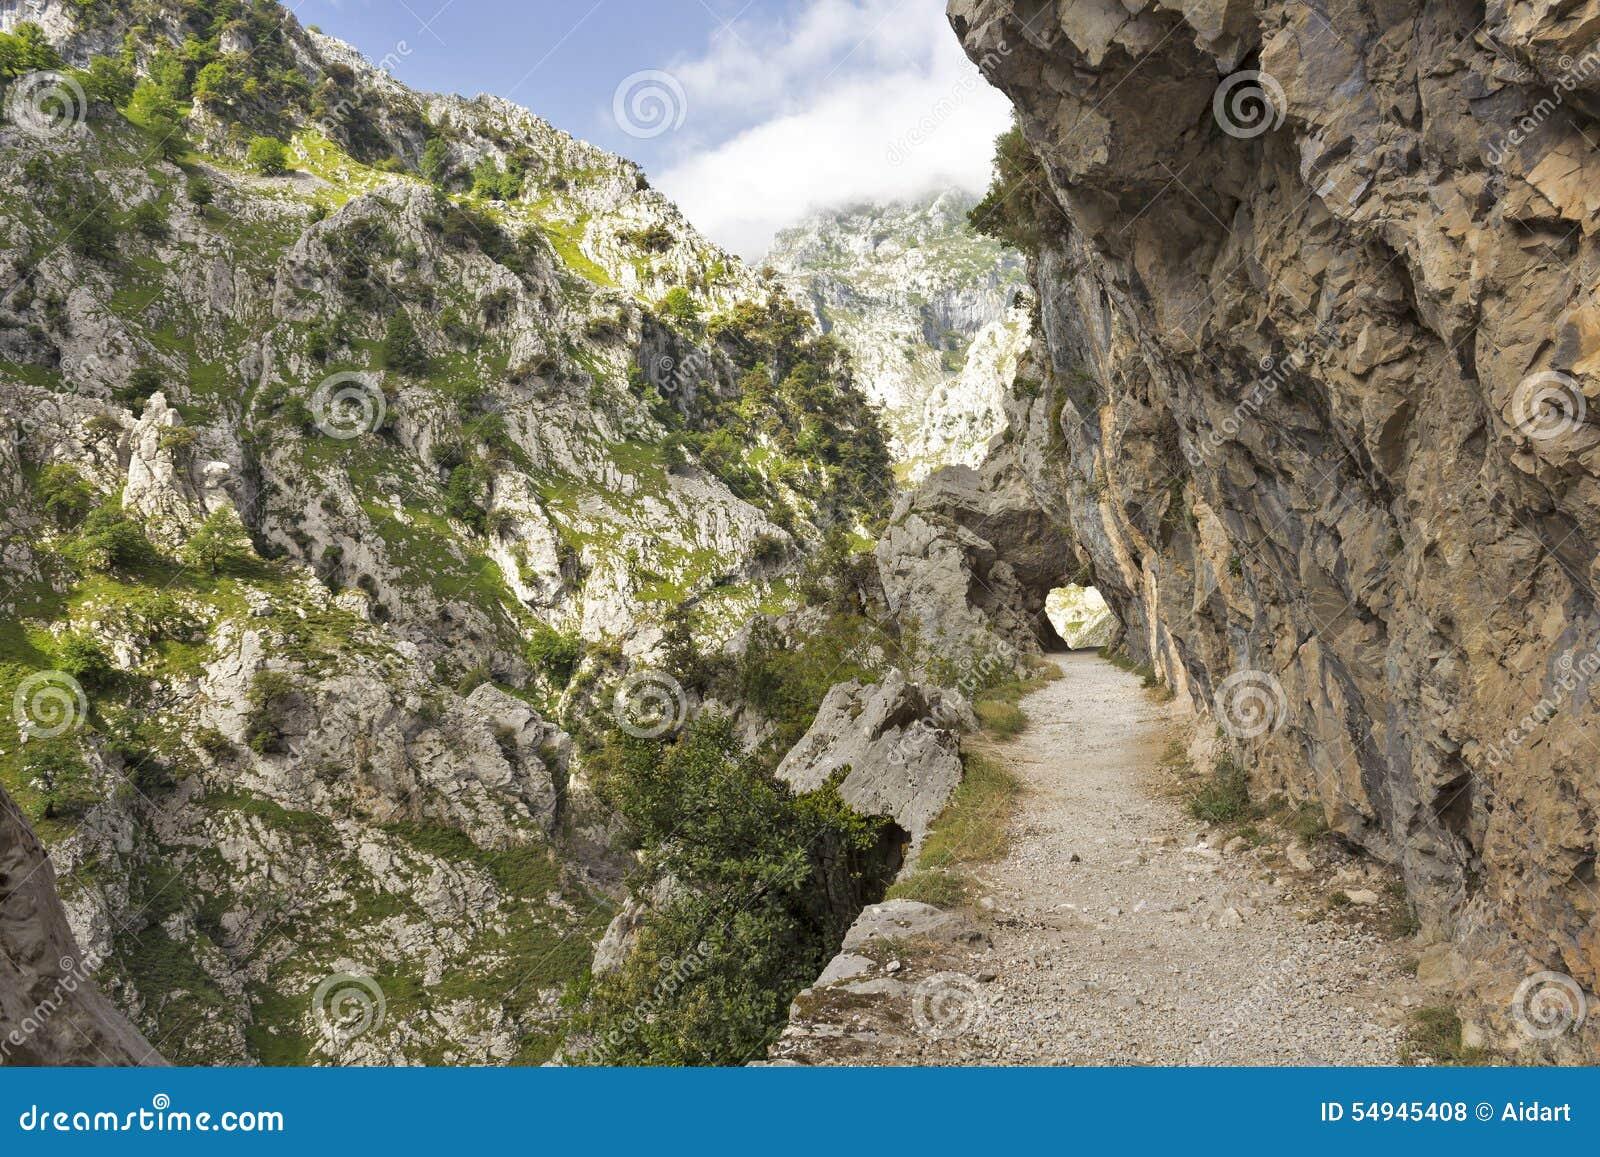 Gorge of River Cares in Asturias